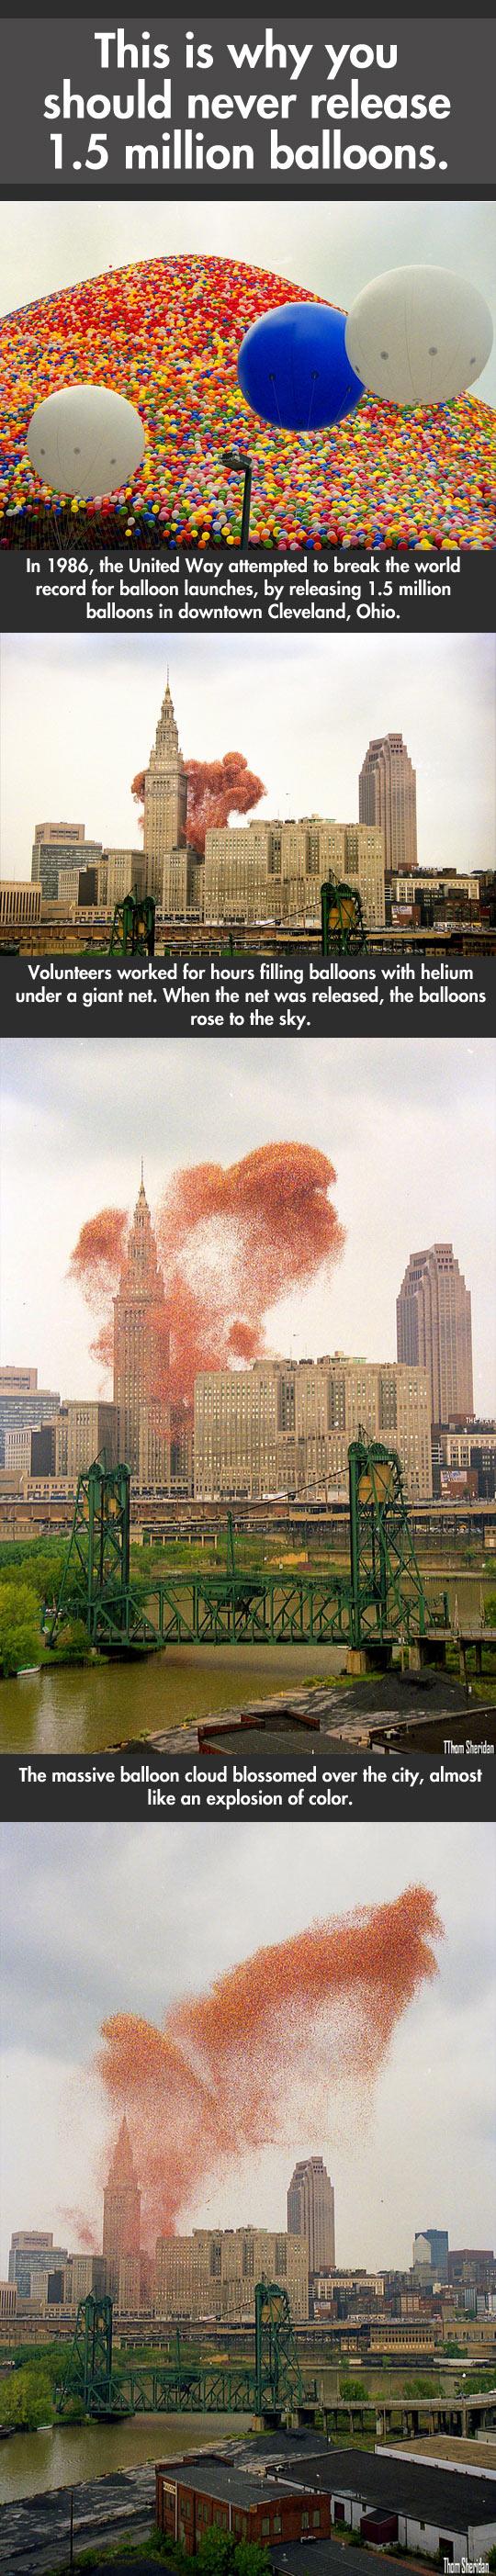 cool-old-pics-balloons-Ohio